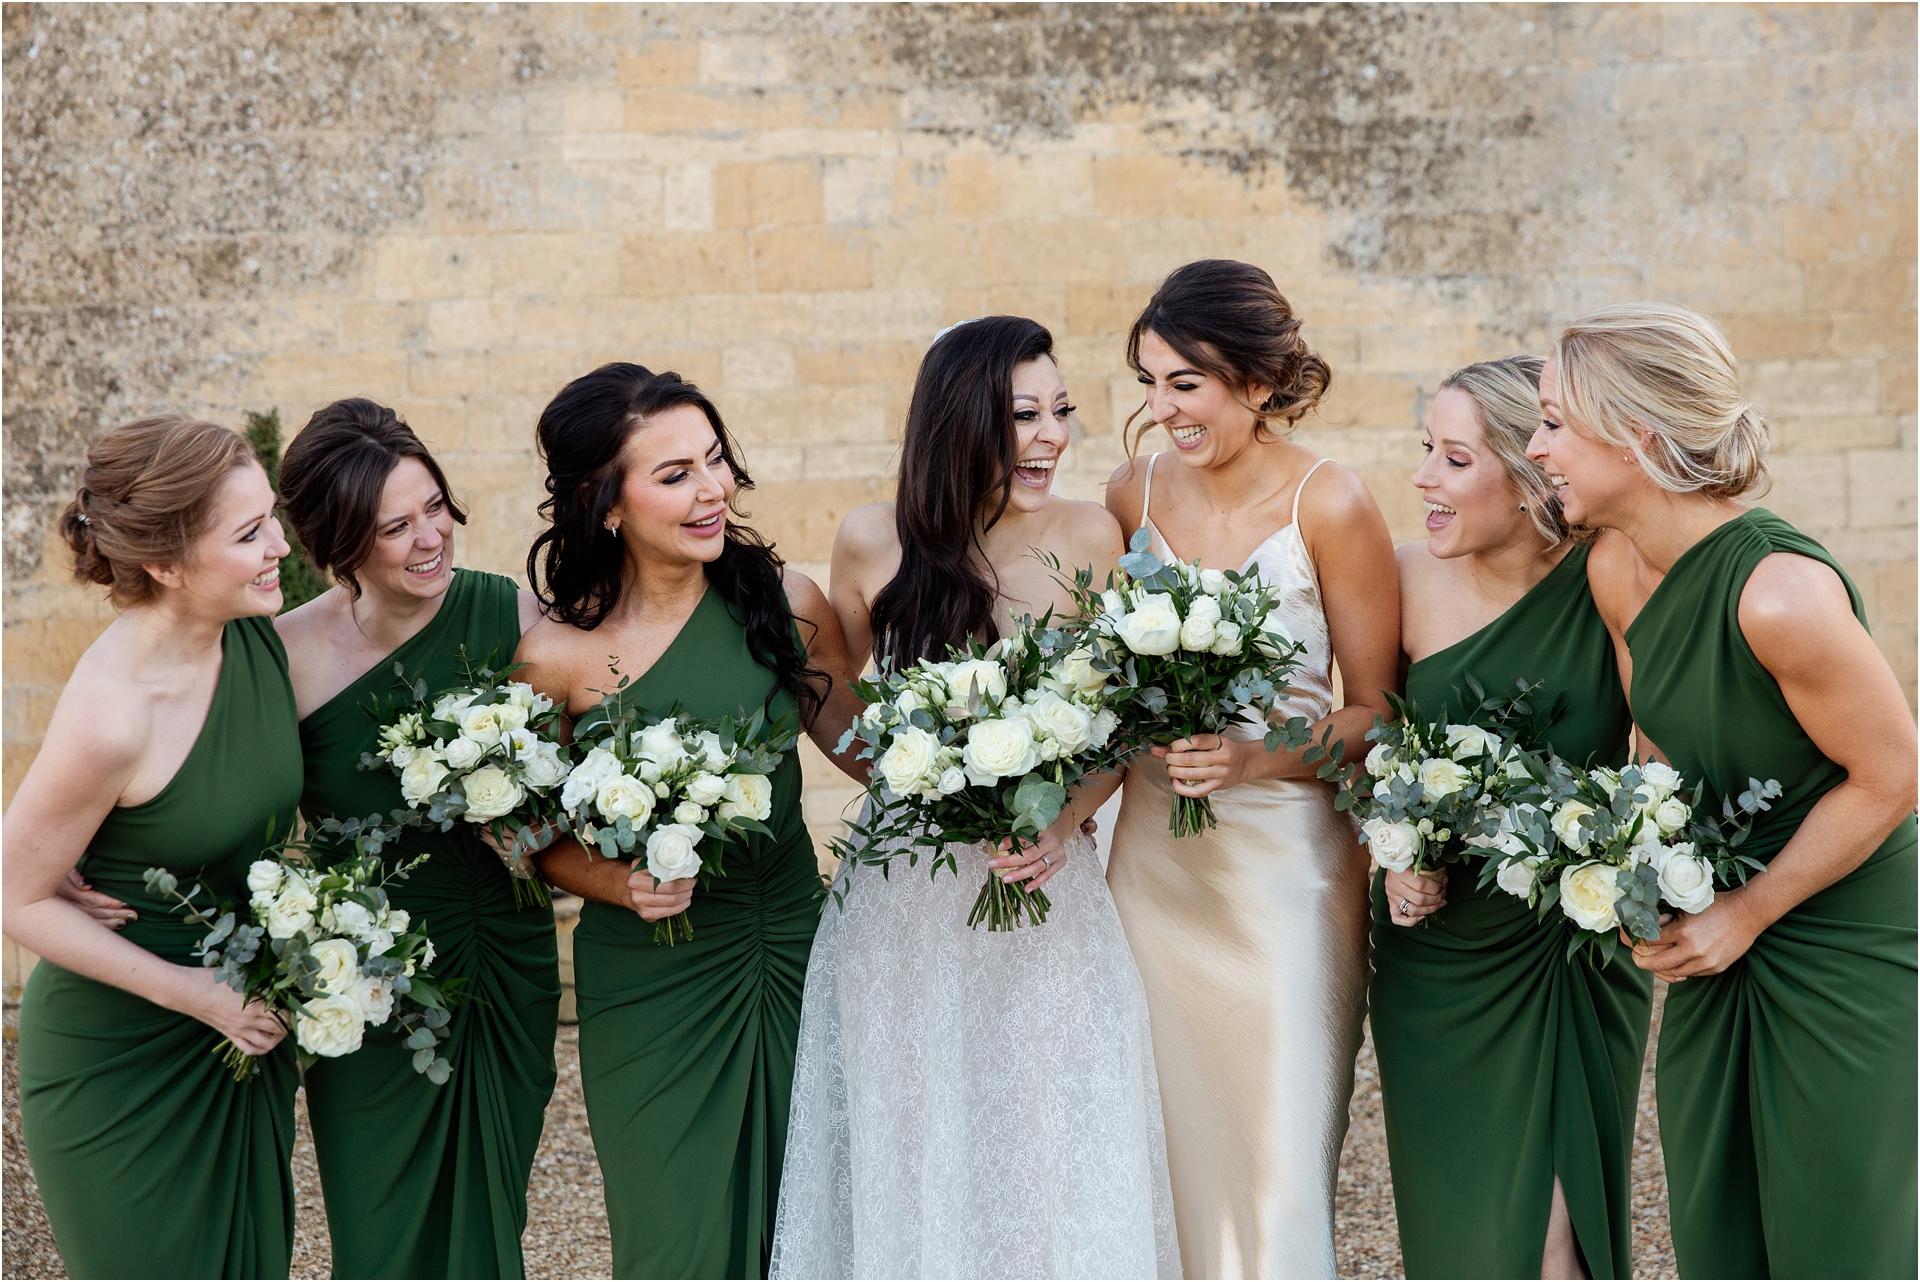 Bridal party at Lapstone Barn wedding